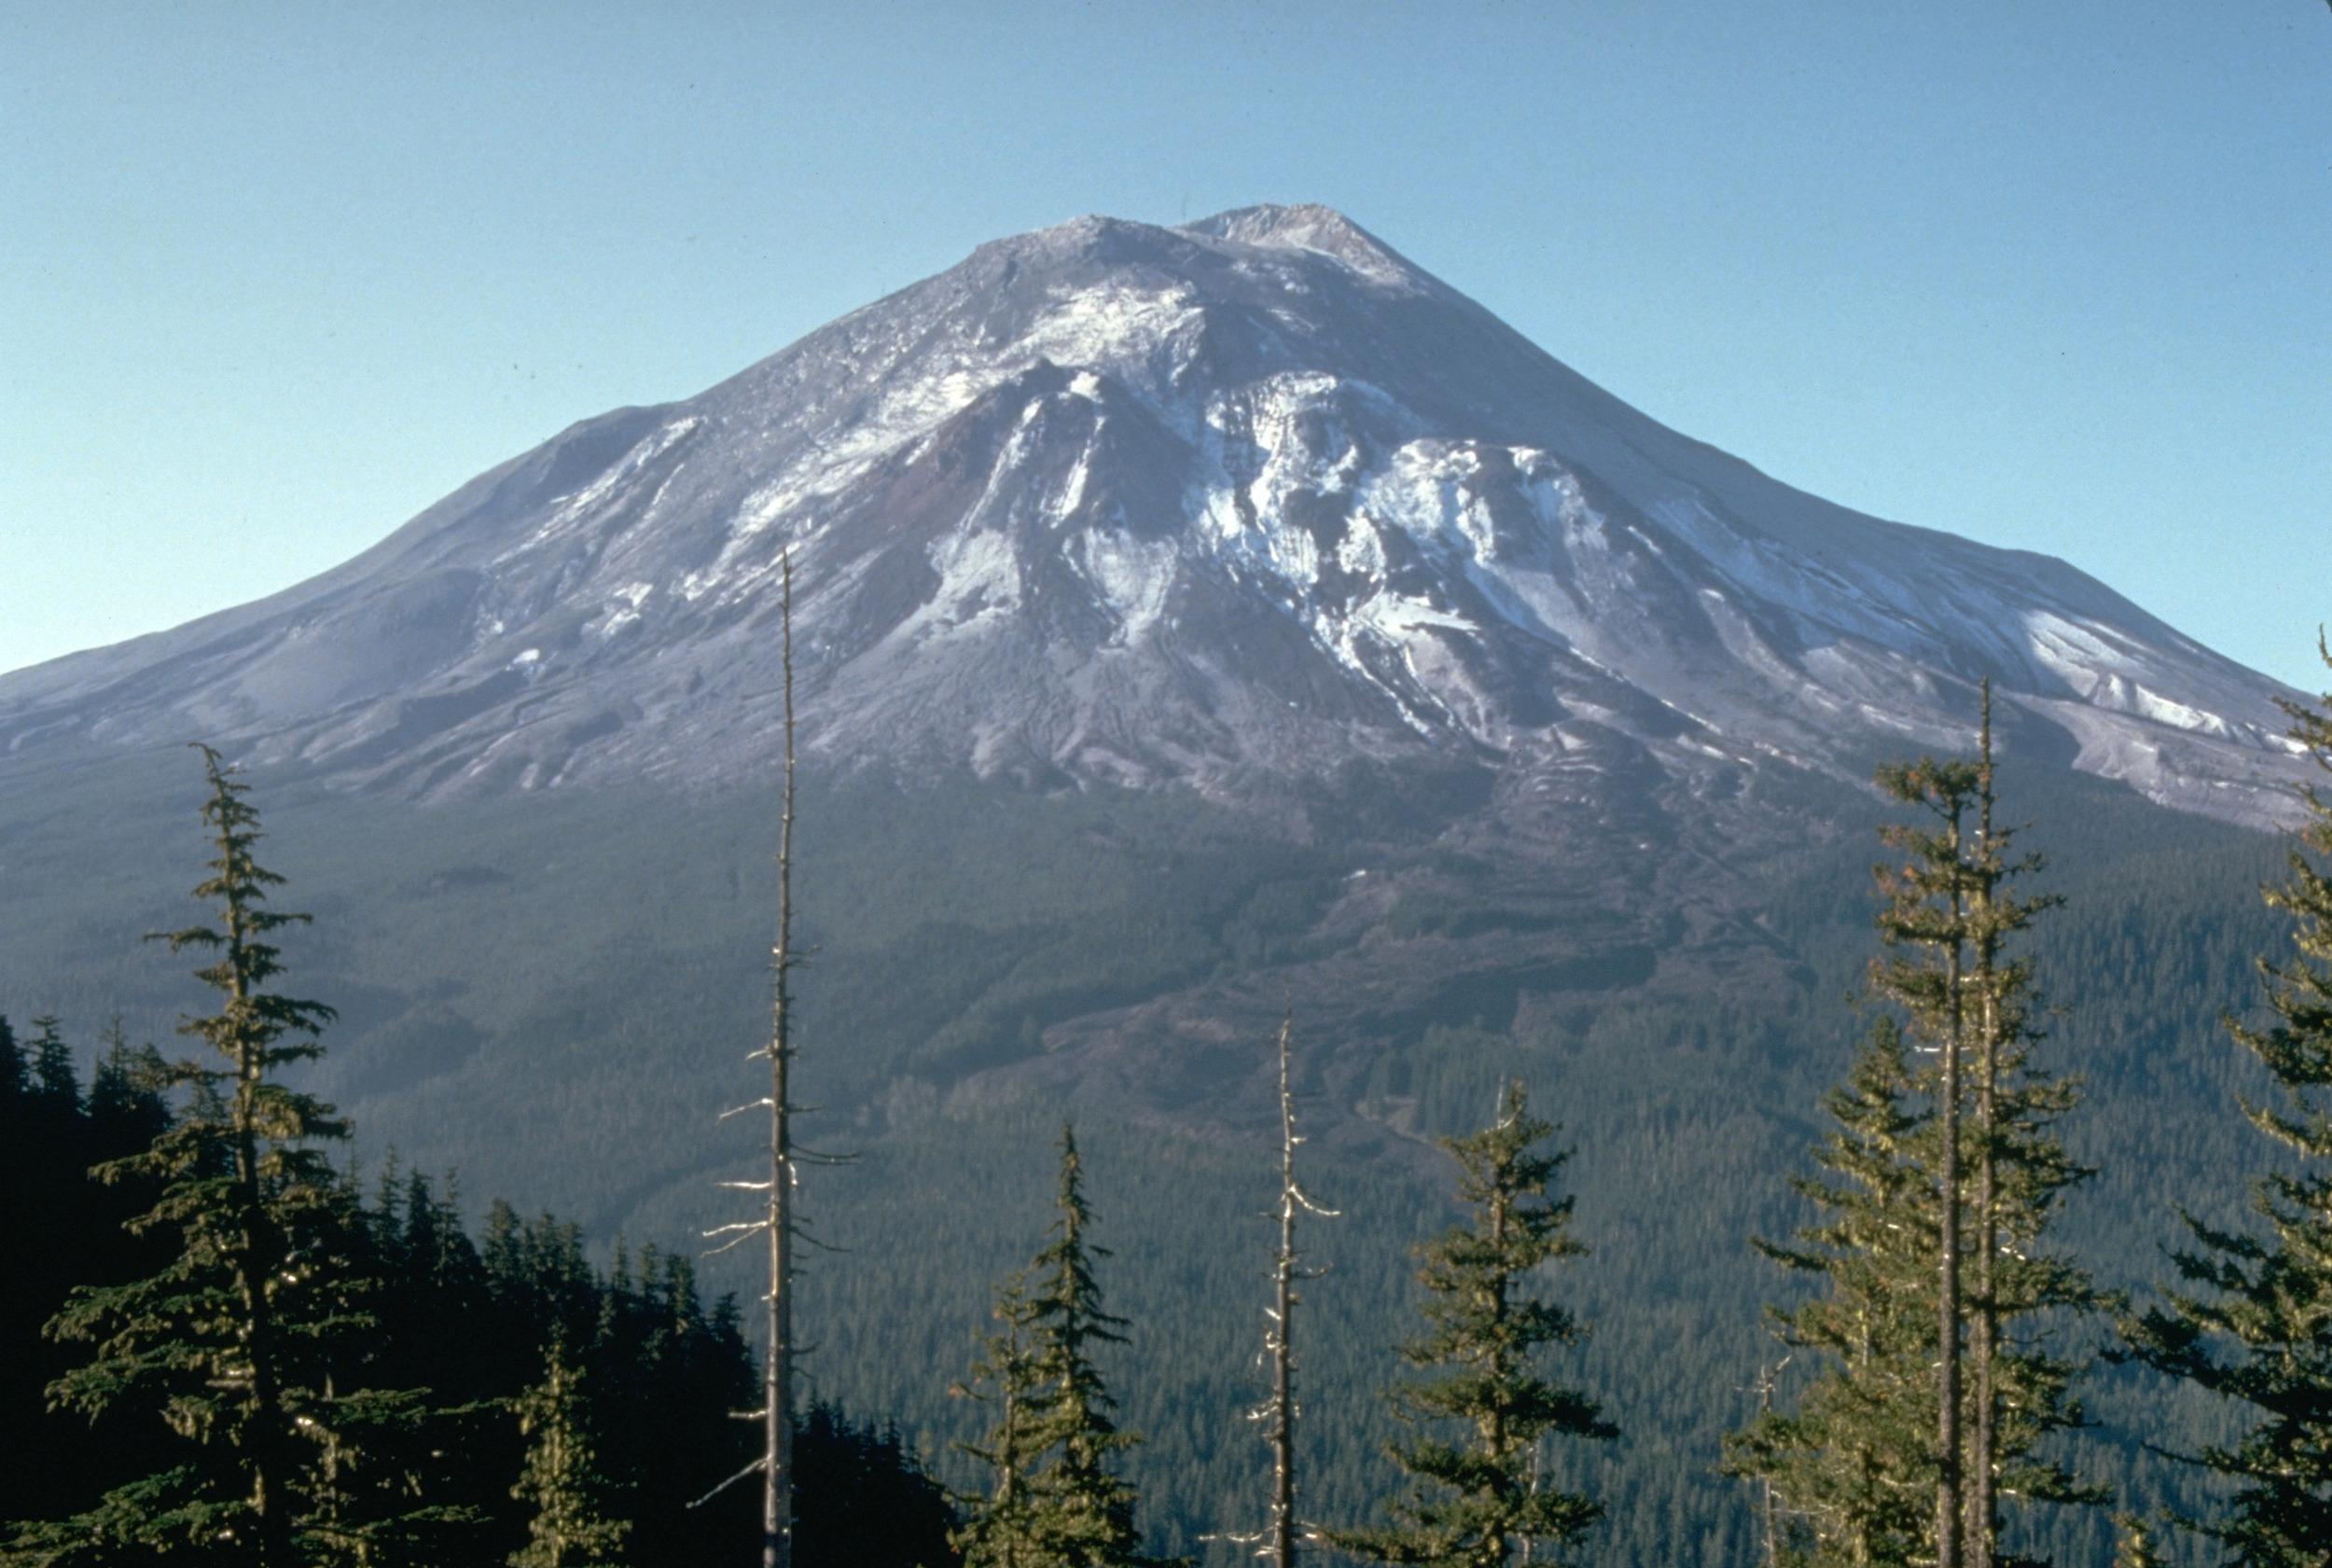 Image: Mount St. Helens